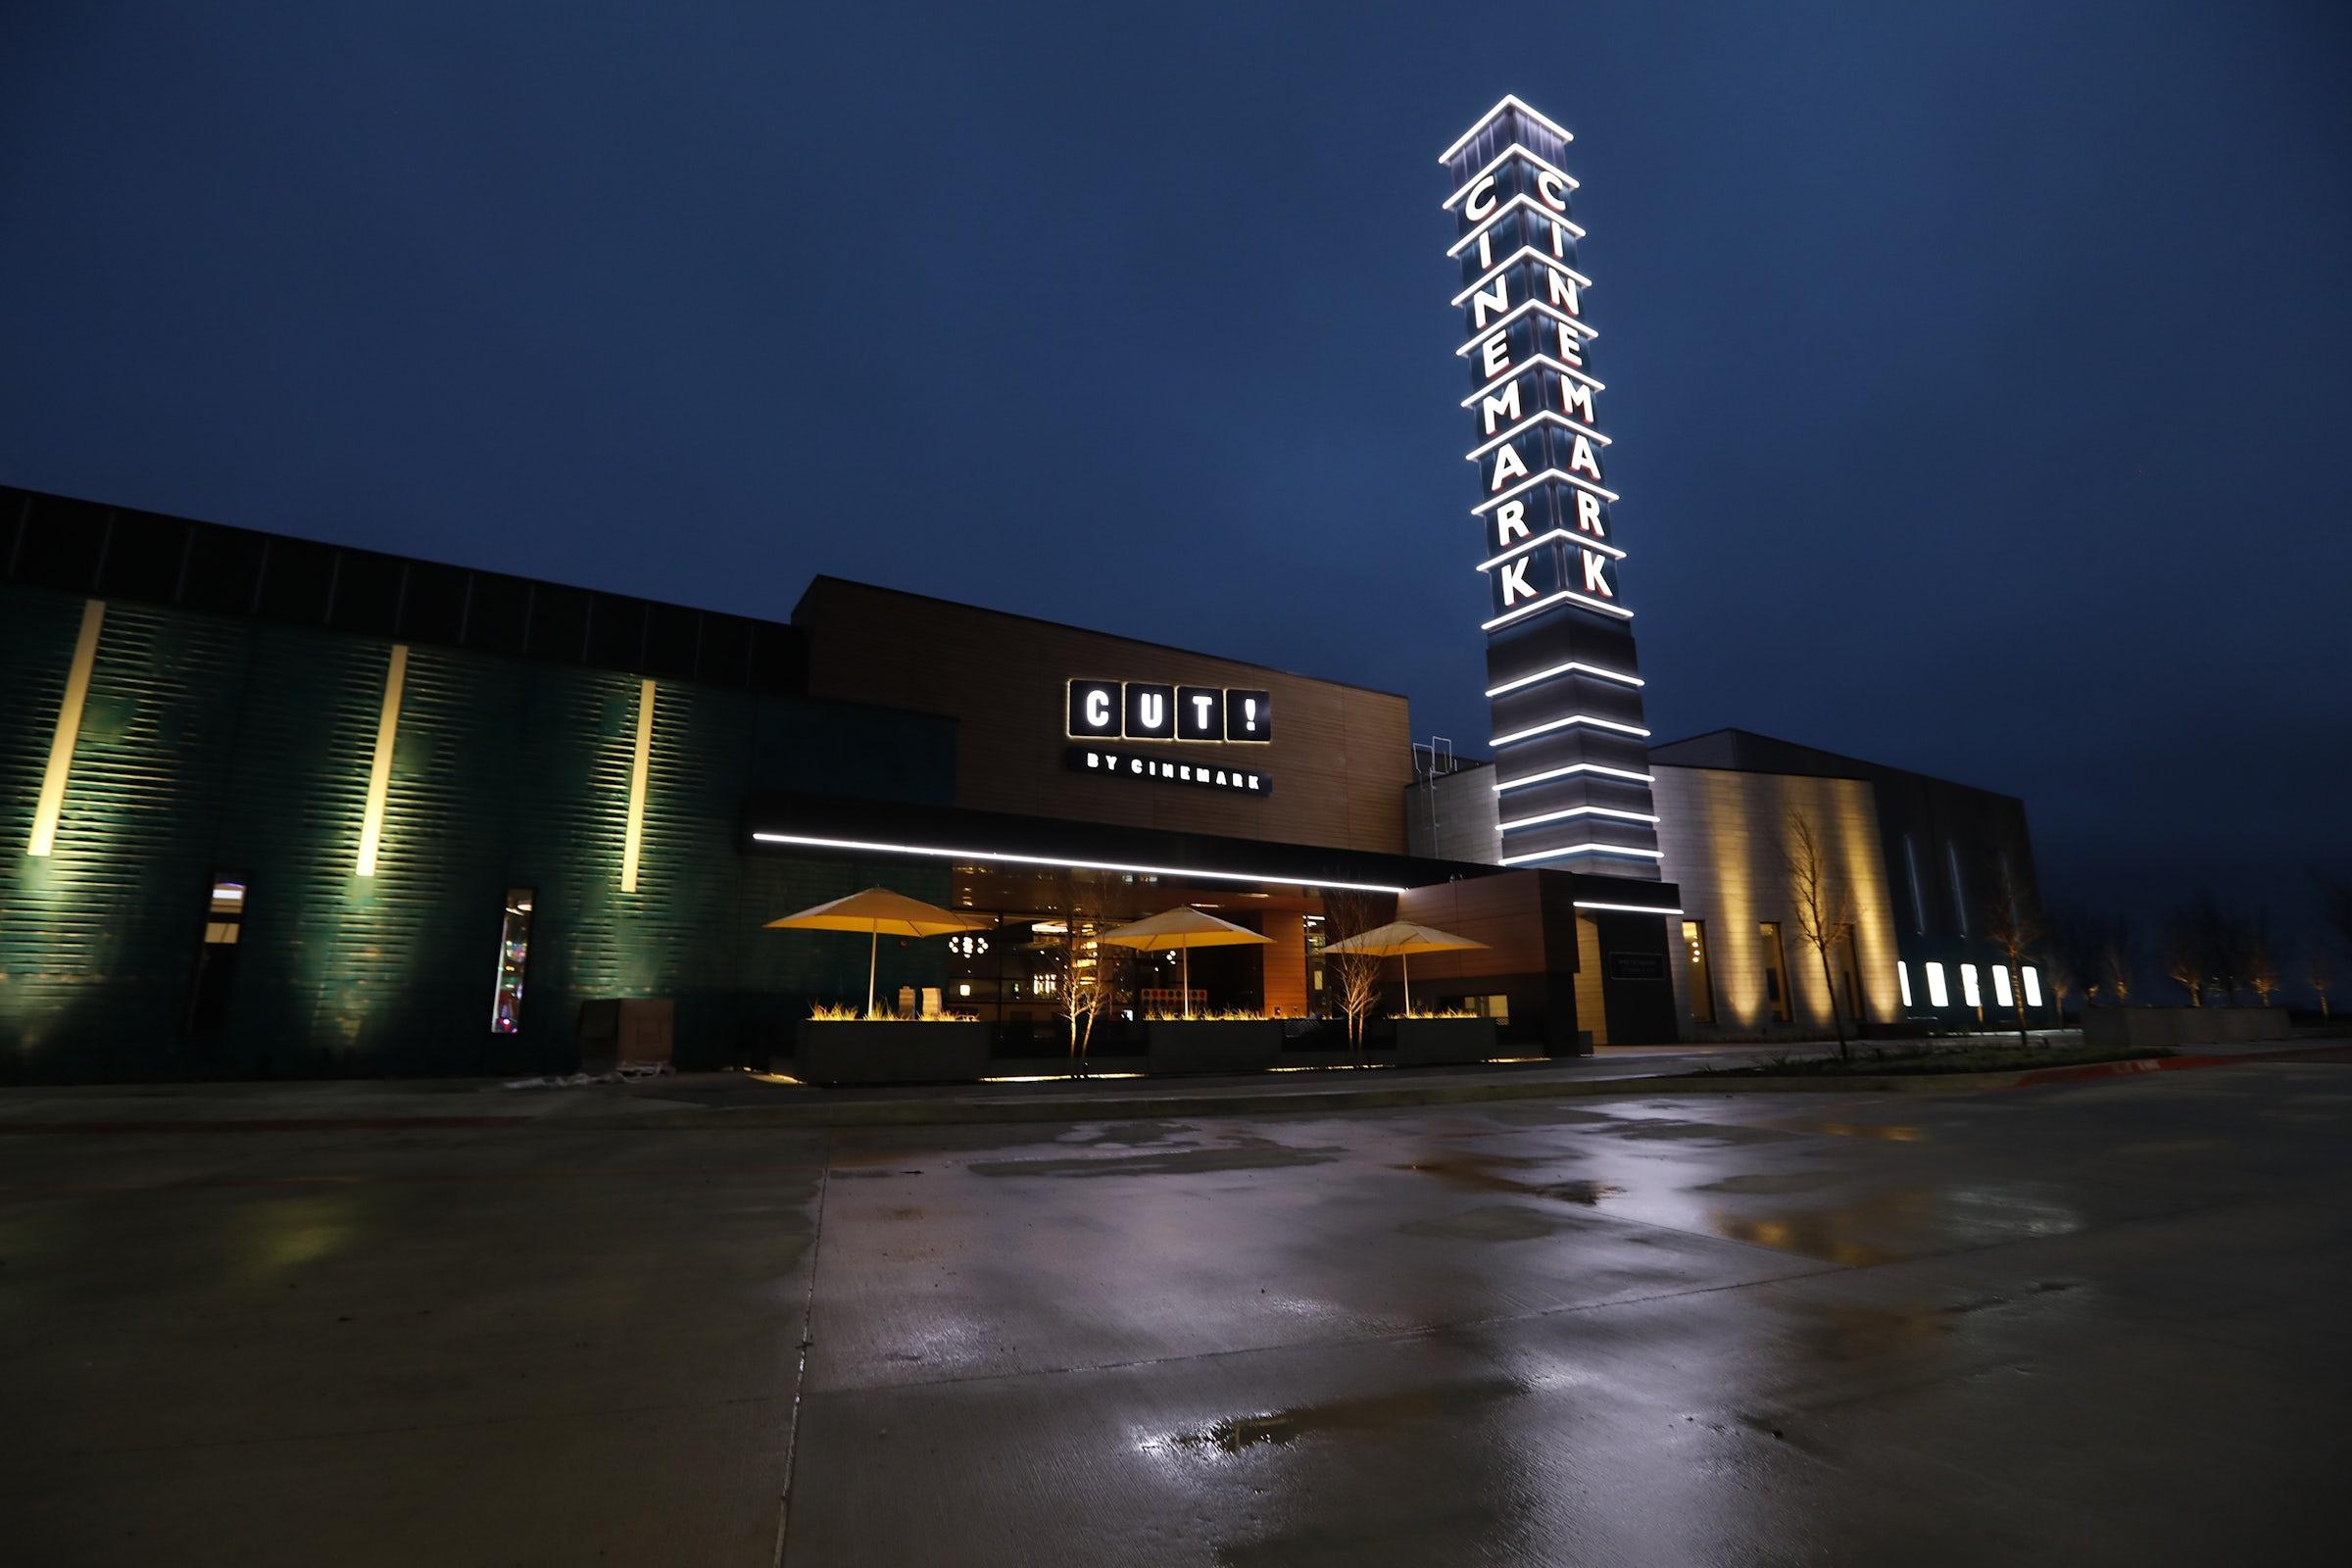 CUT! By Cinemark in Beyond Dallas